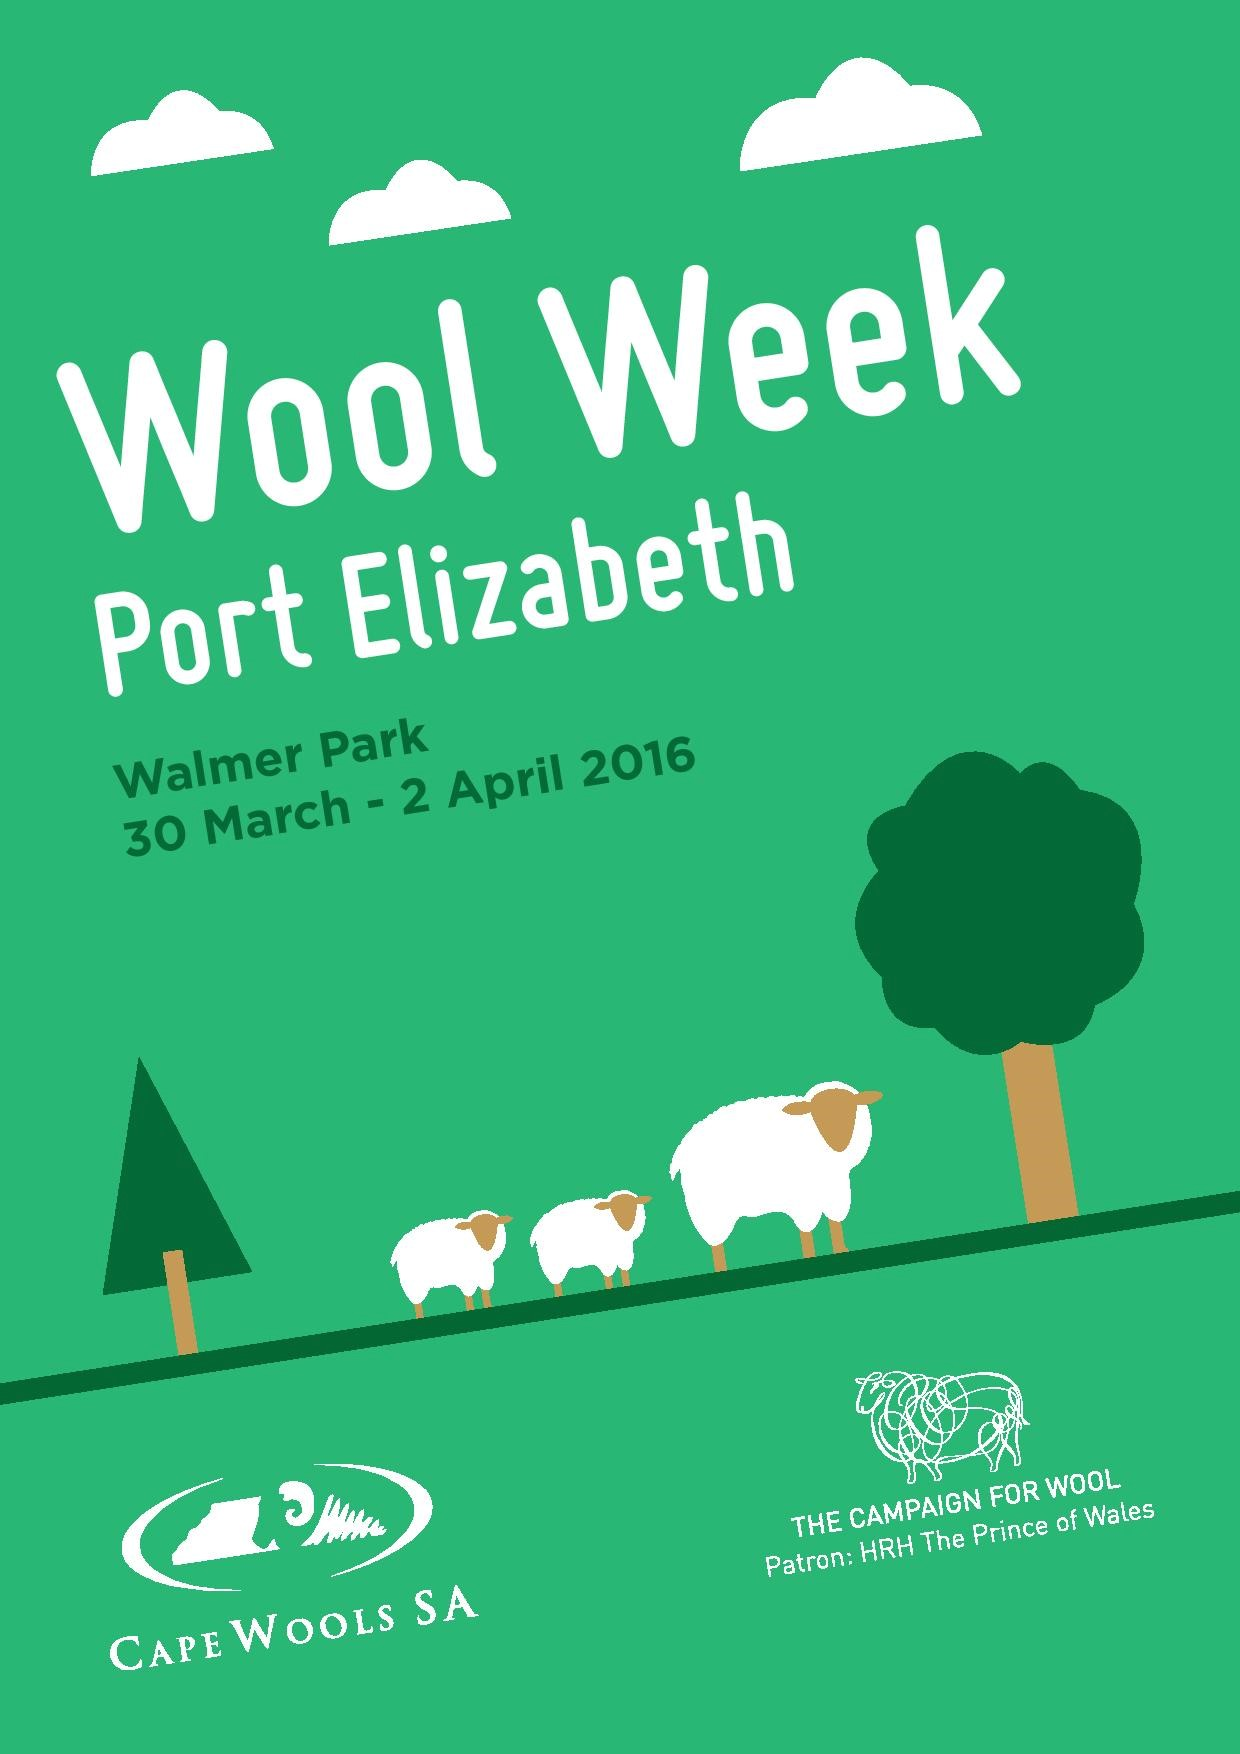 SA Wool Week